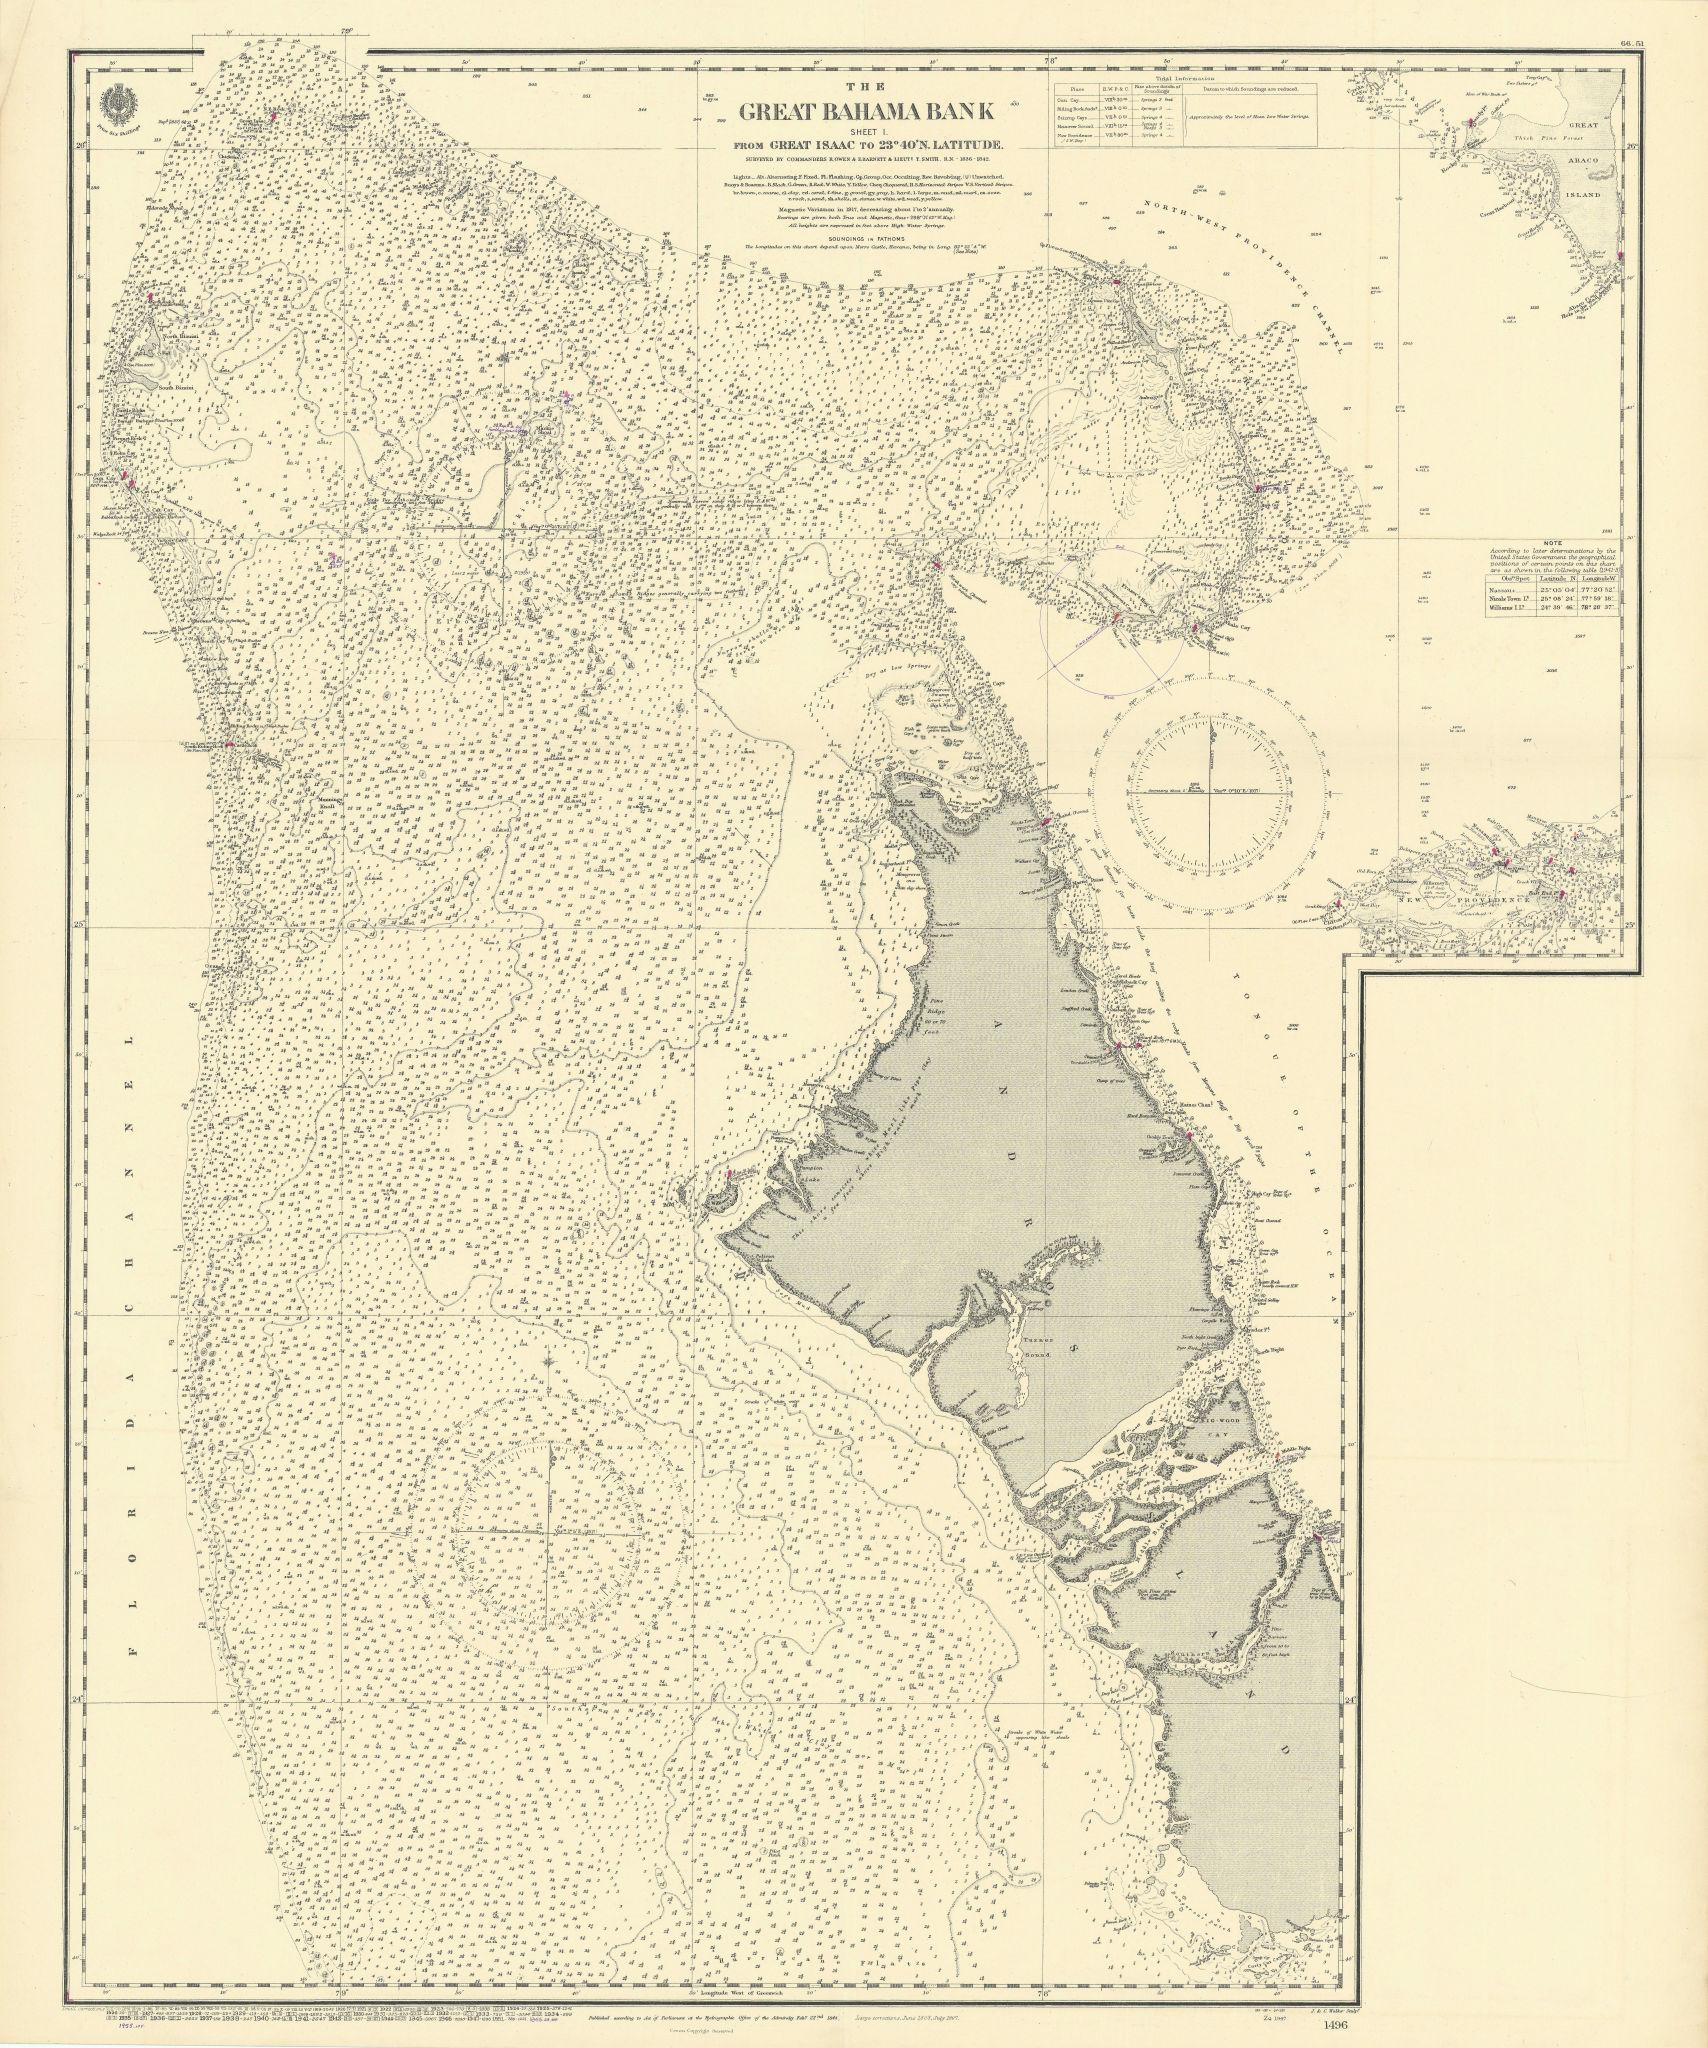 Great Bahama Bank. Andros. New Providence. ADMIRALTY sea chart 1844 (1955) map